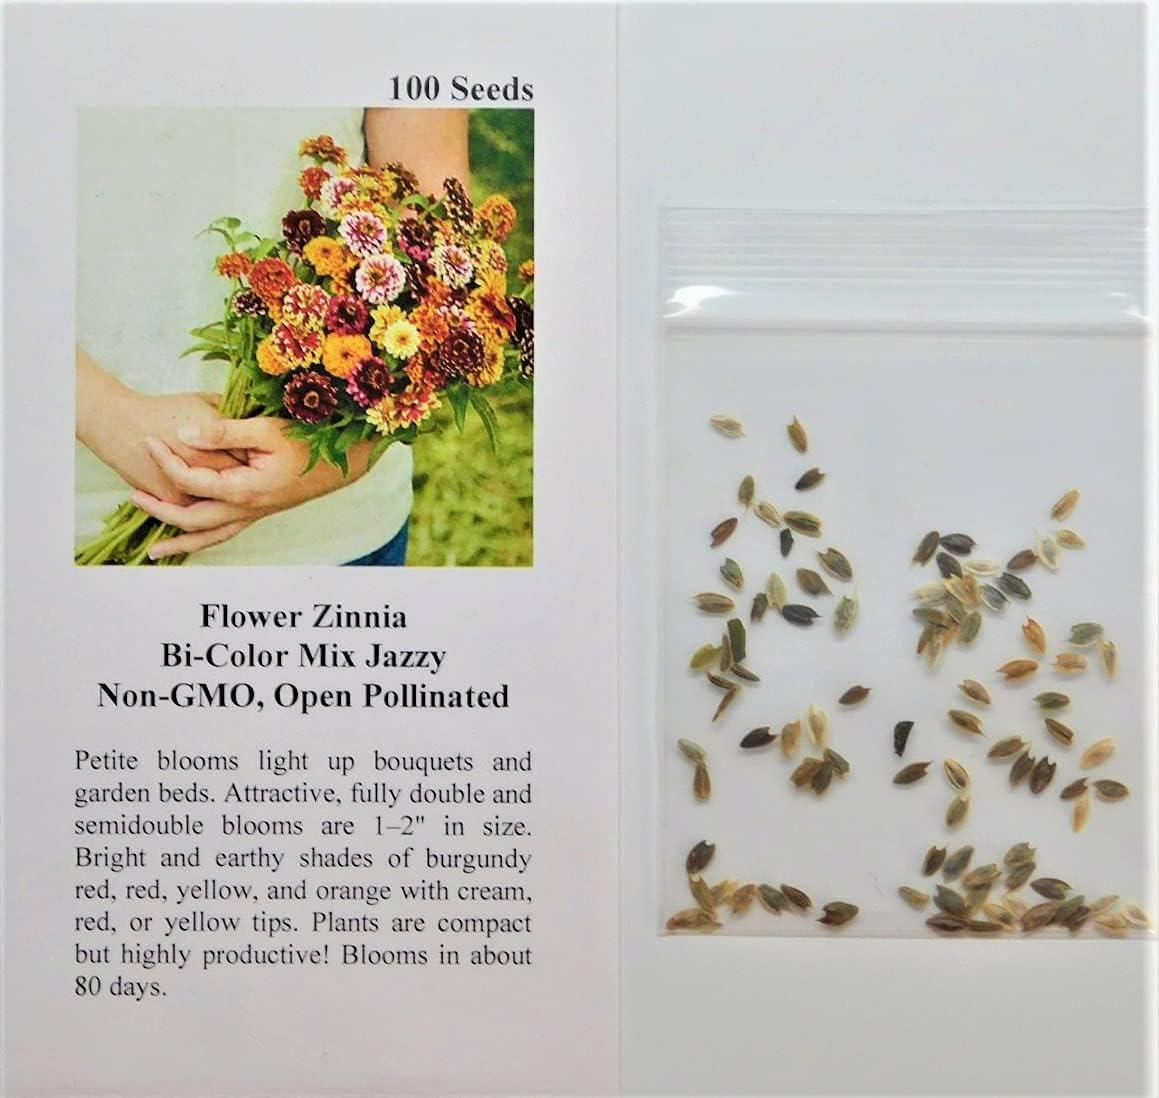 David's Garden Seeds Flower Zinnia Bi-Color Mix Jazzy 1131 (Multi) 100 Non-GMO, Open Pollinated Seeds